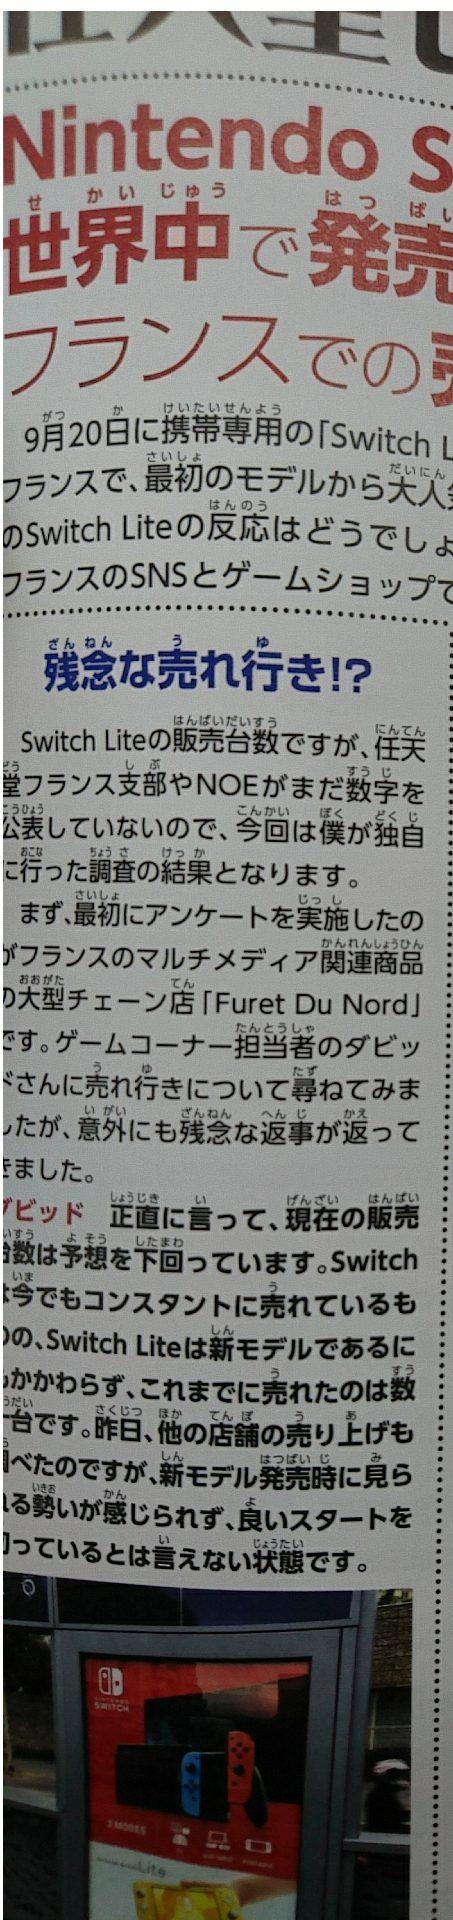 dotup.org1976185 - 大型チェーンゲーム担当「Switch Liteは新モデルなのに勢いを感じず予想以下、良いスタートとは言えない」